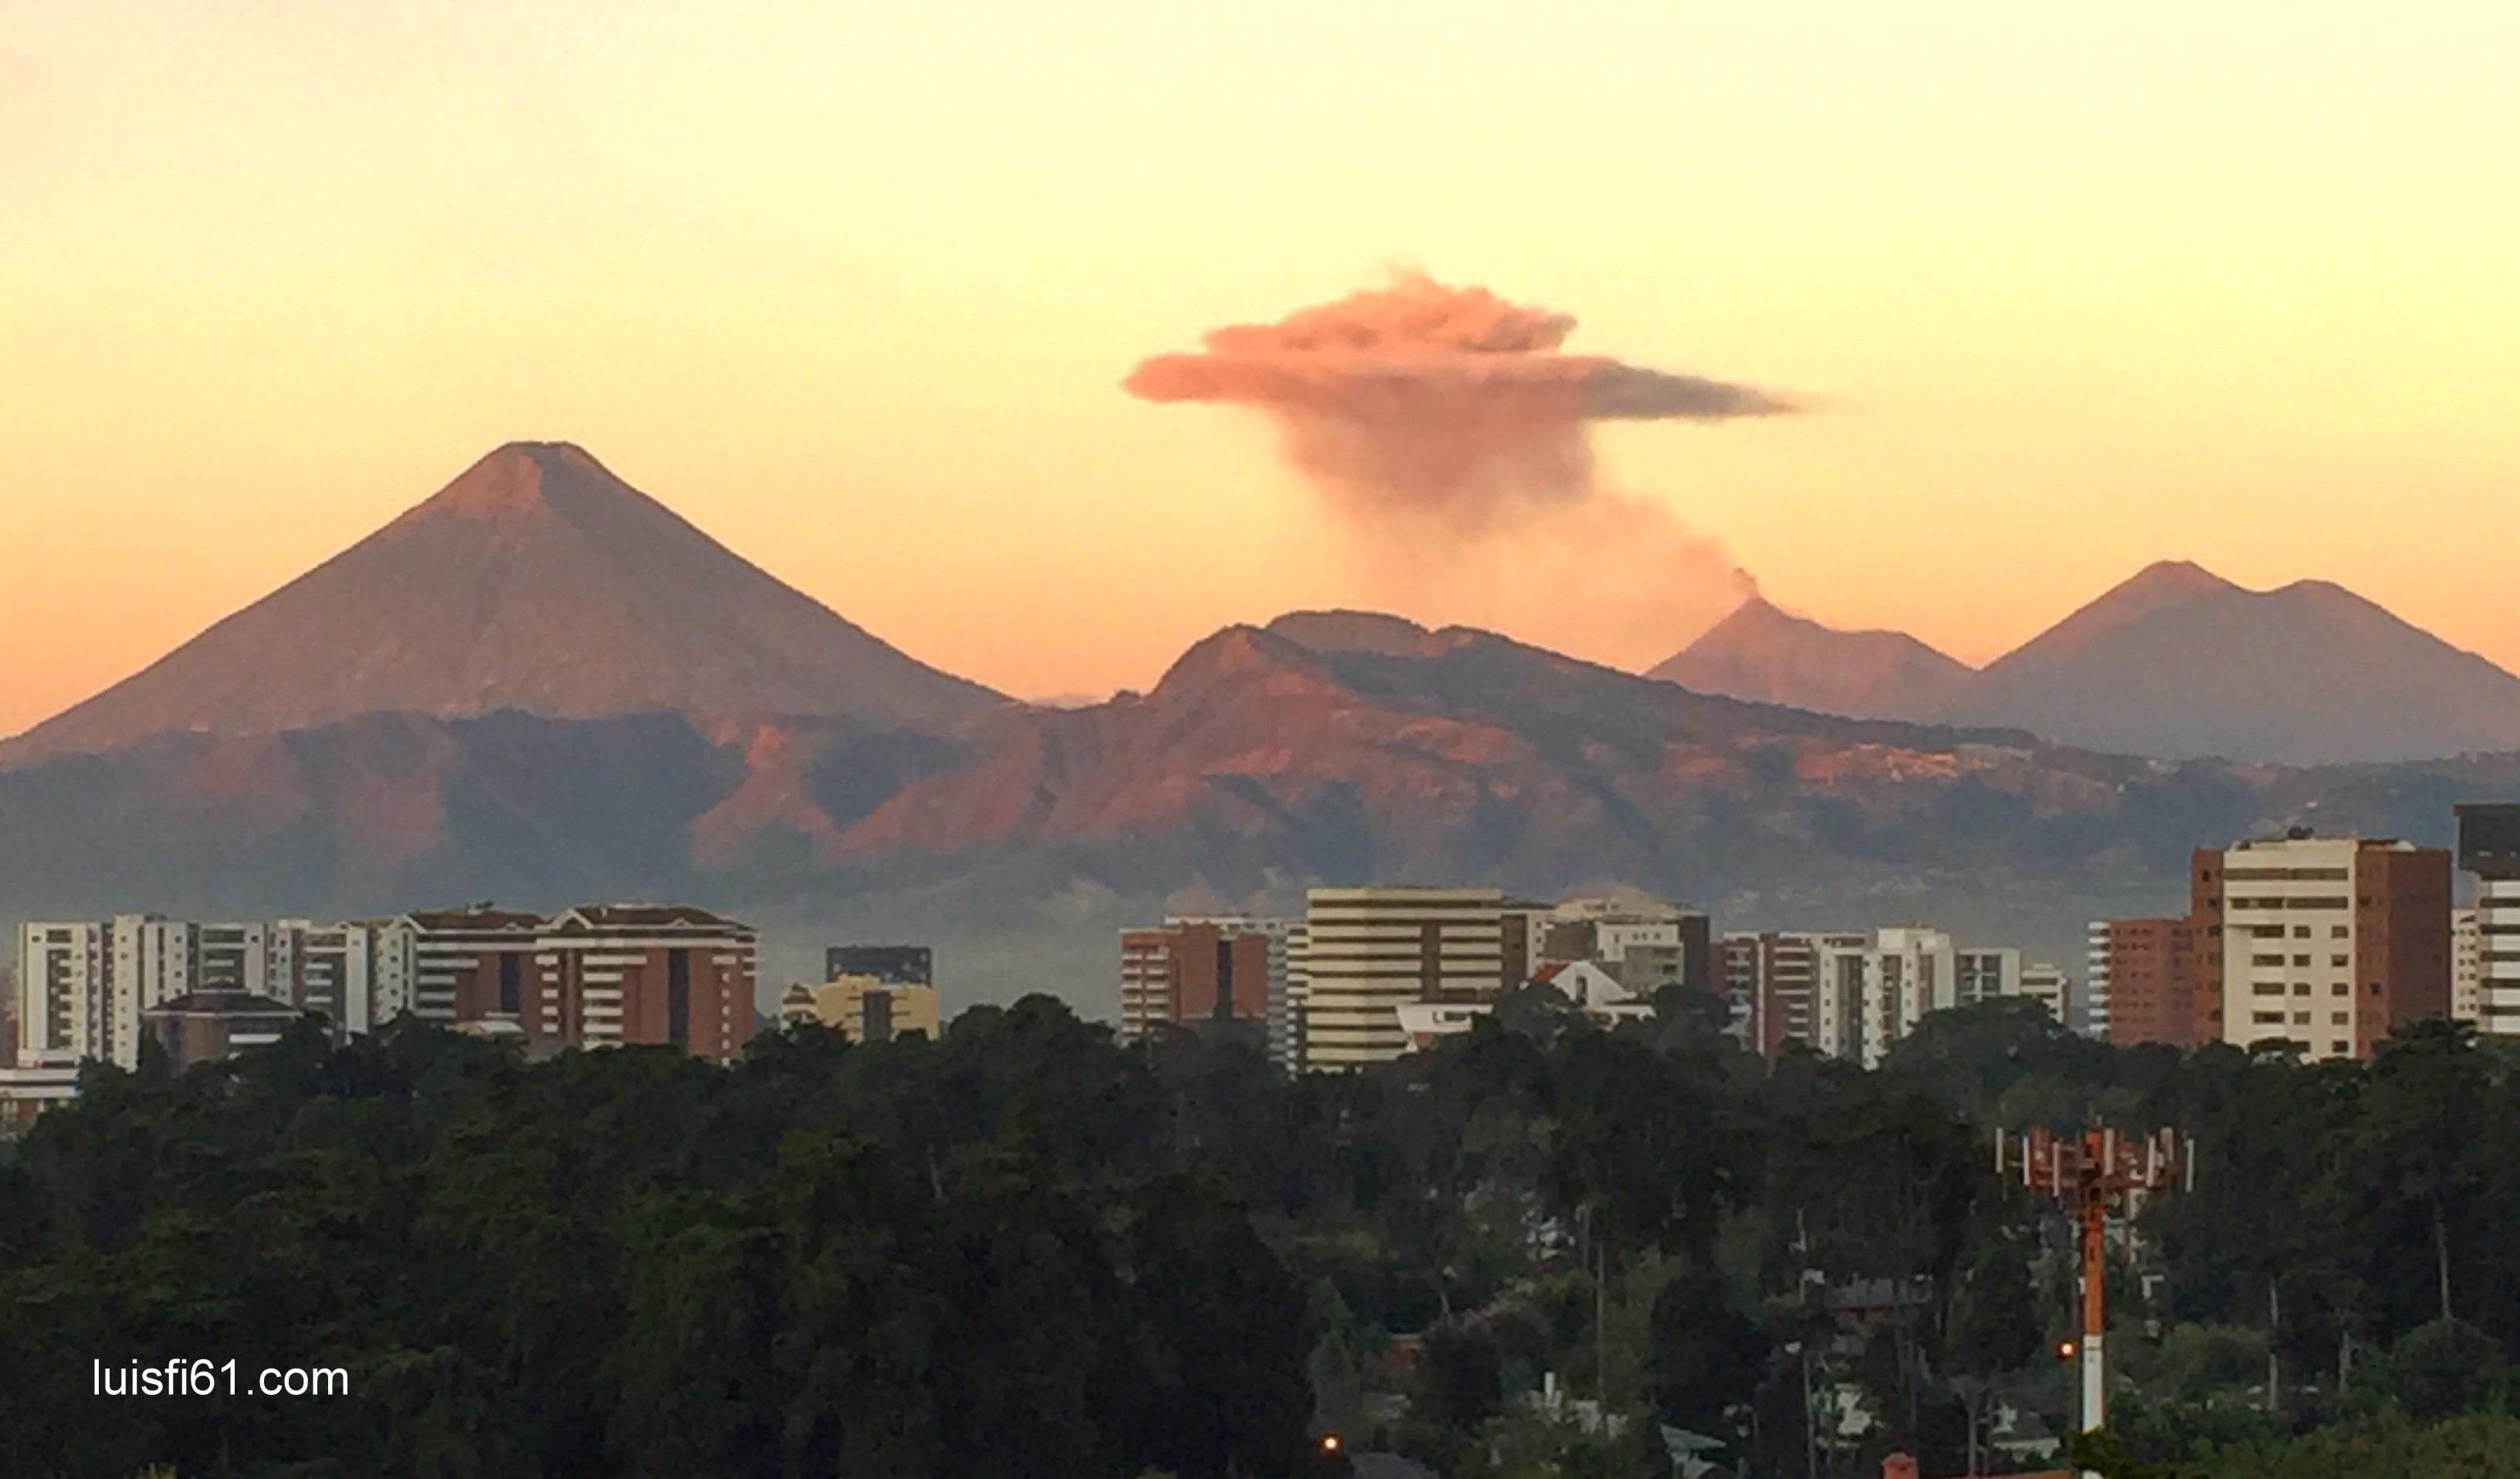 170130-volcanes-luis-figueroa-2